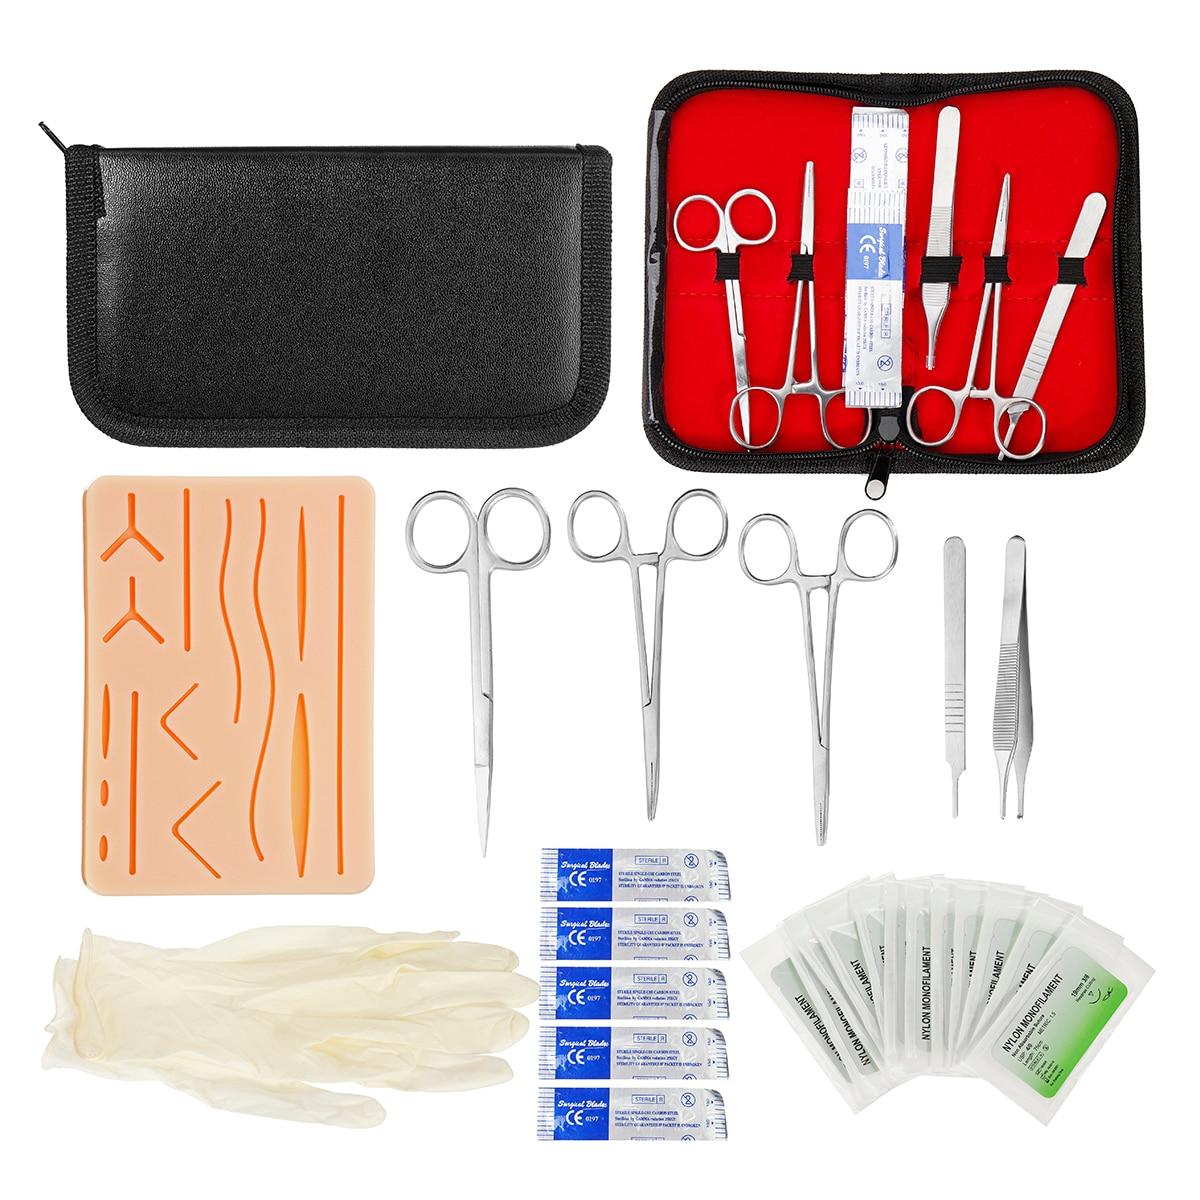 25-en-1-peau-medical-suture-chirurgicale-formation-kit-de-suture-formation-silicone-pad-aiguille-ciseaux-outil-kit